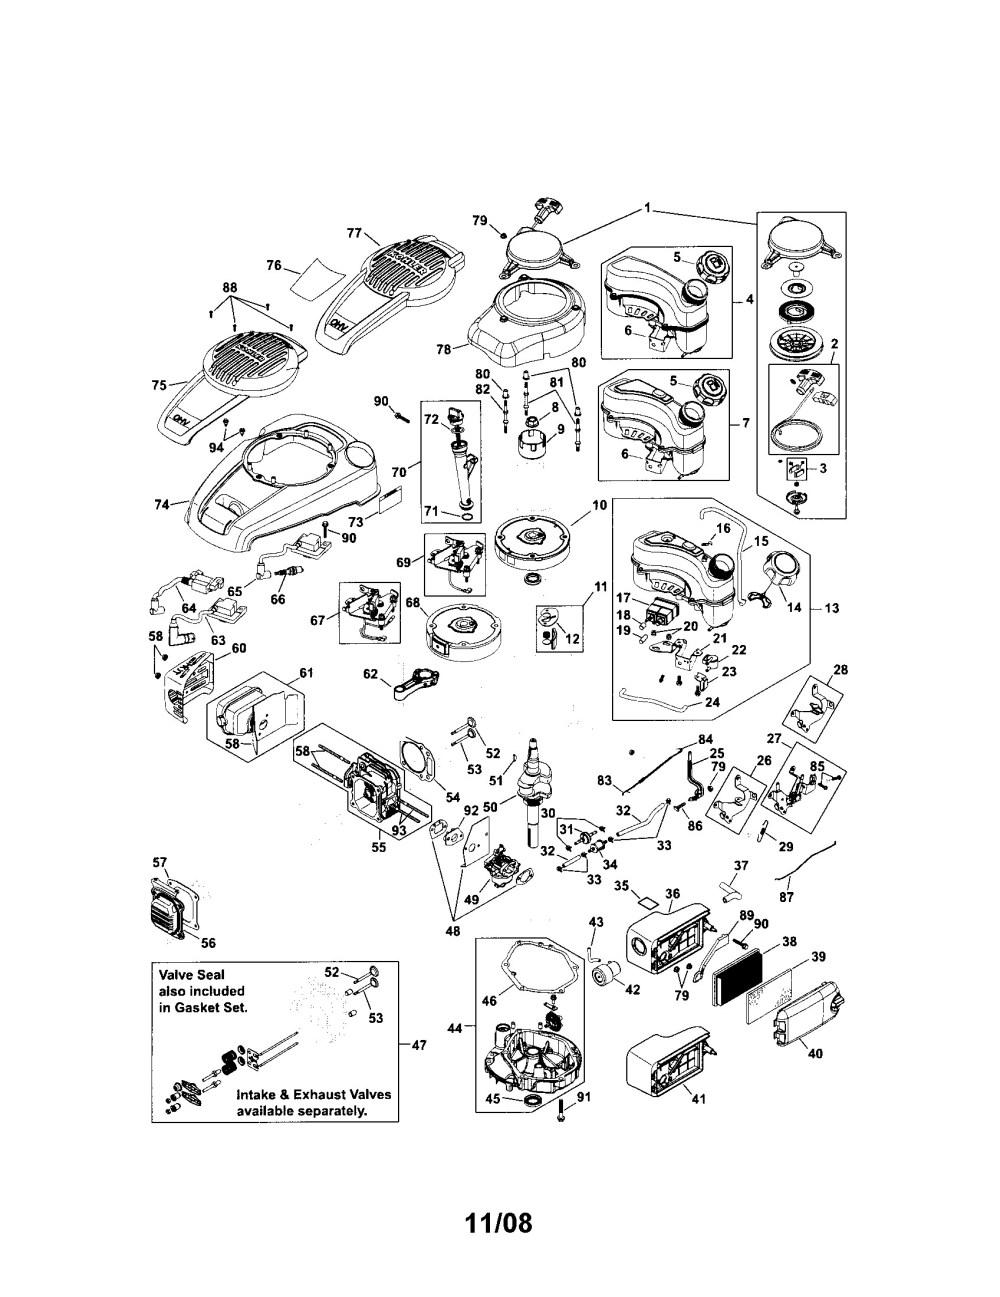 medium resolution of kohler k301s engine parts diagrams data wiring diagrams u2022 kohler carburetor breakdown kohler k321 engine